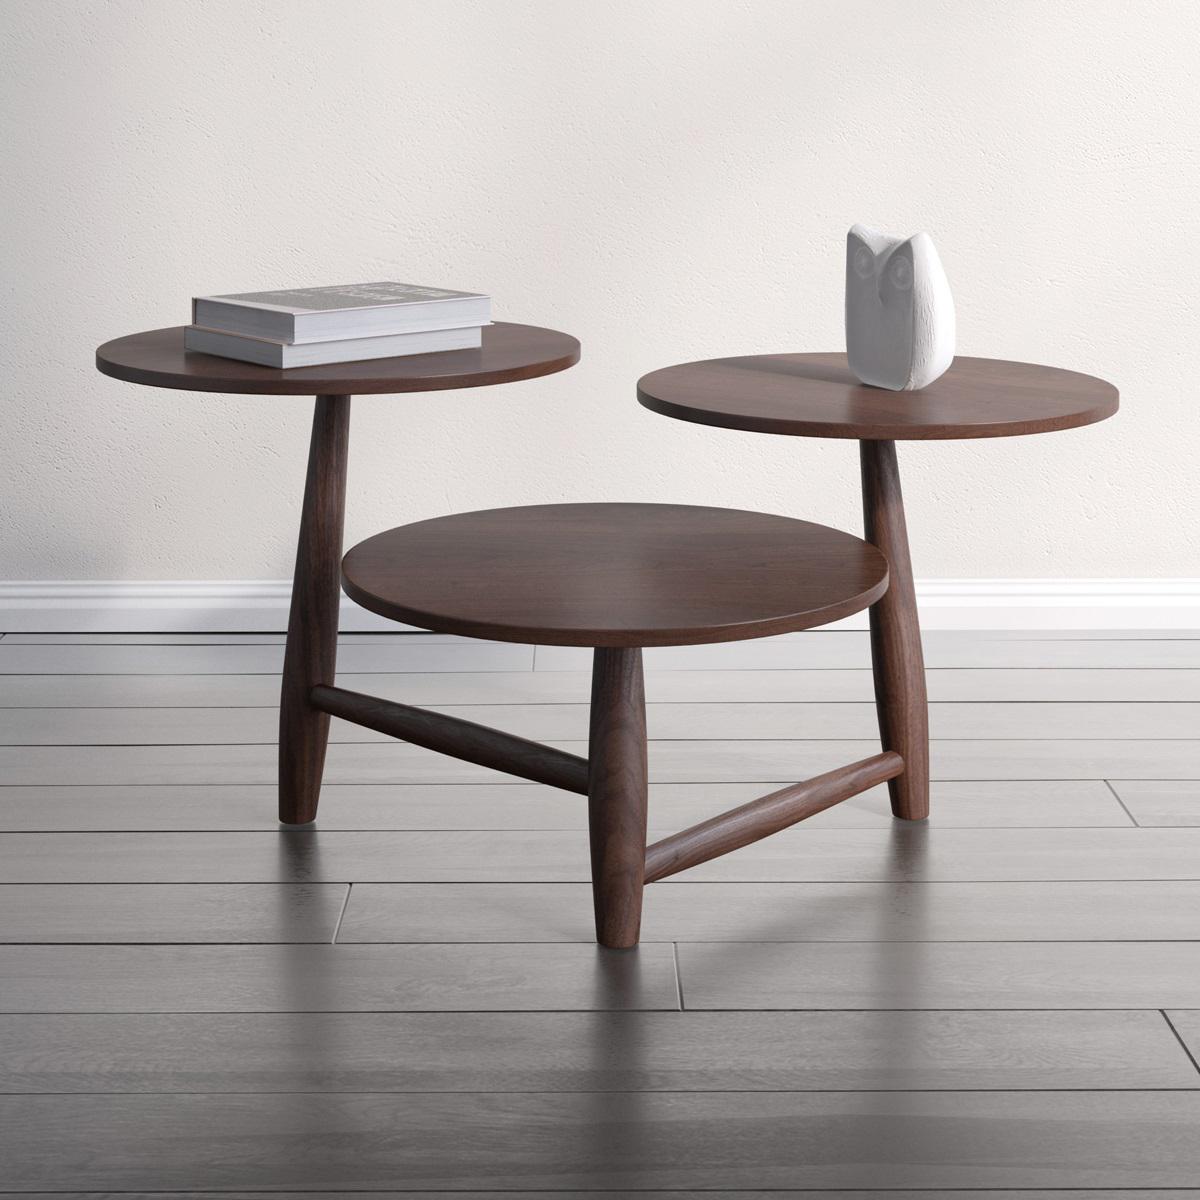 Charmant Sean Dix Tripod Coffee Table